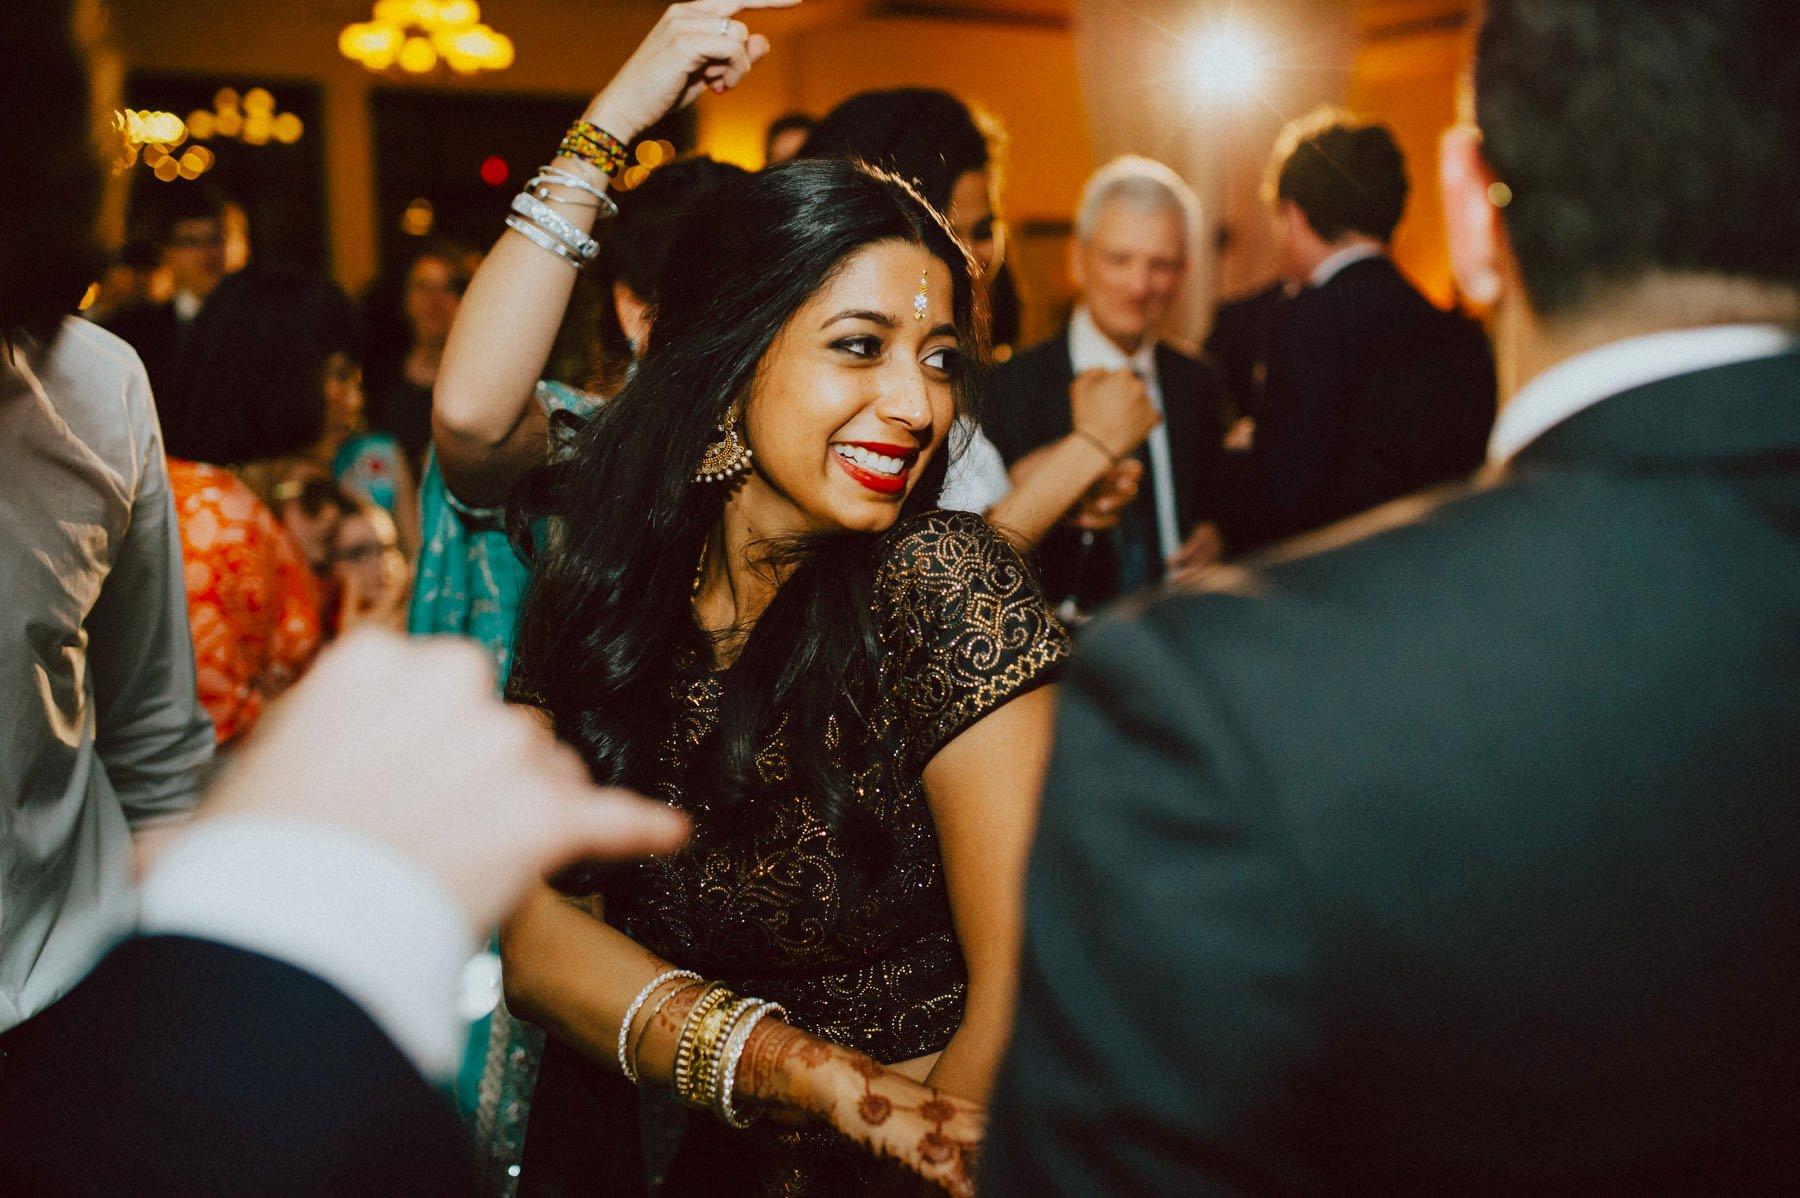 vie-philadelphia-indian-wedding-123.jpg